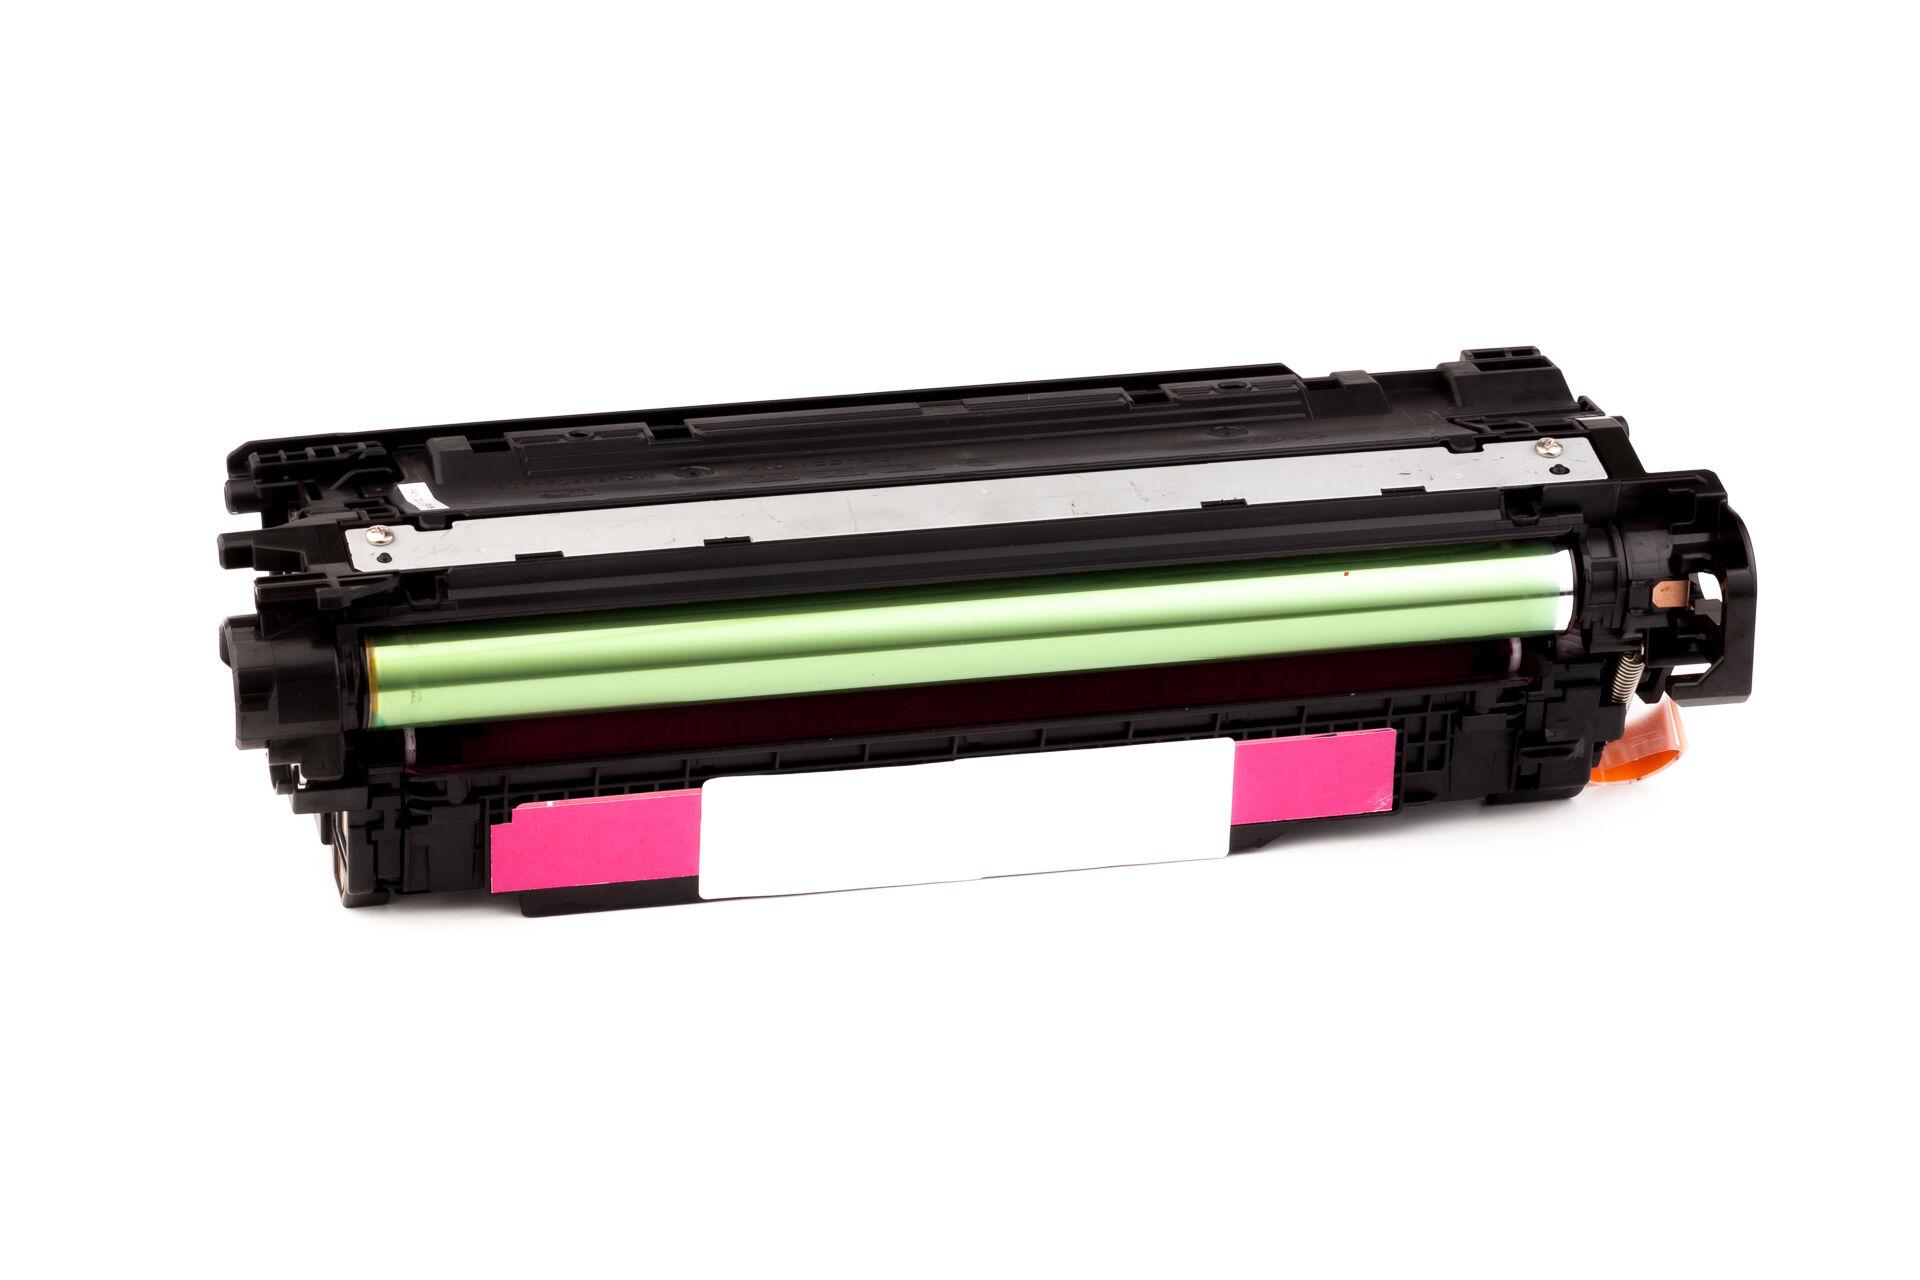 HP Cartouche de Toner pour HP CE403A / 507A magenta compatible (de marque ASC)